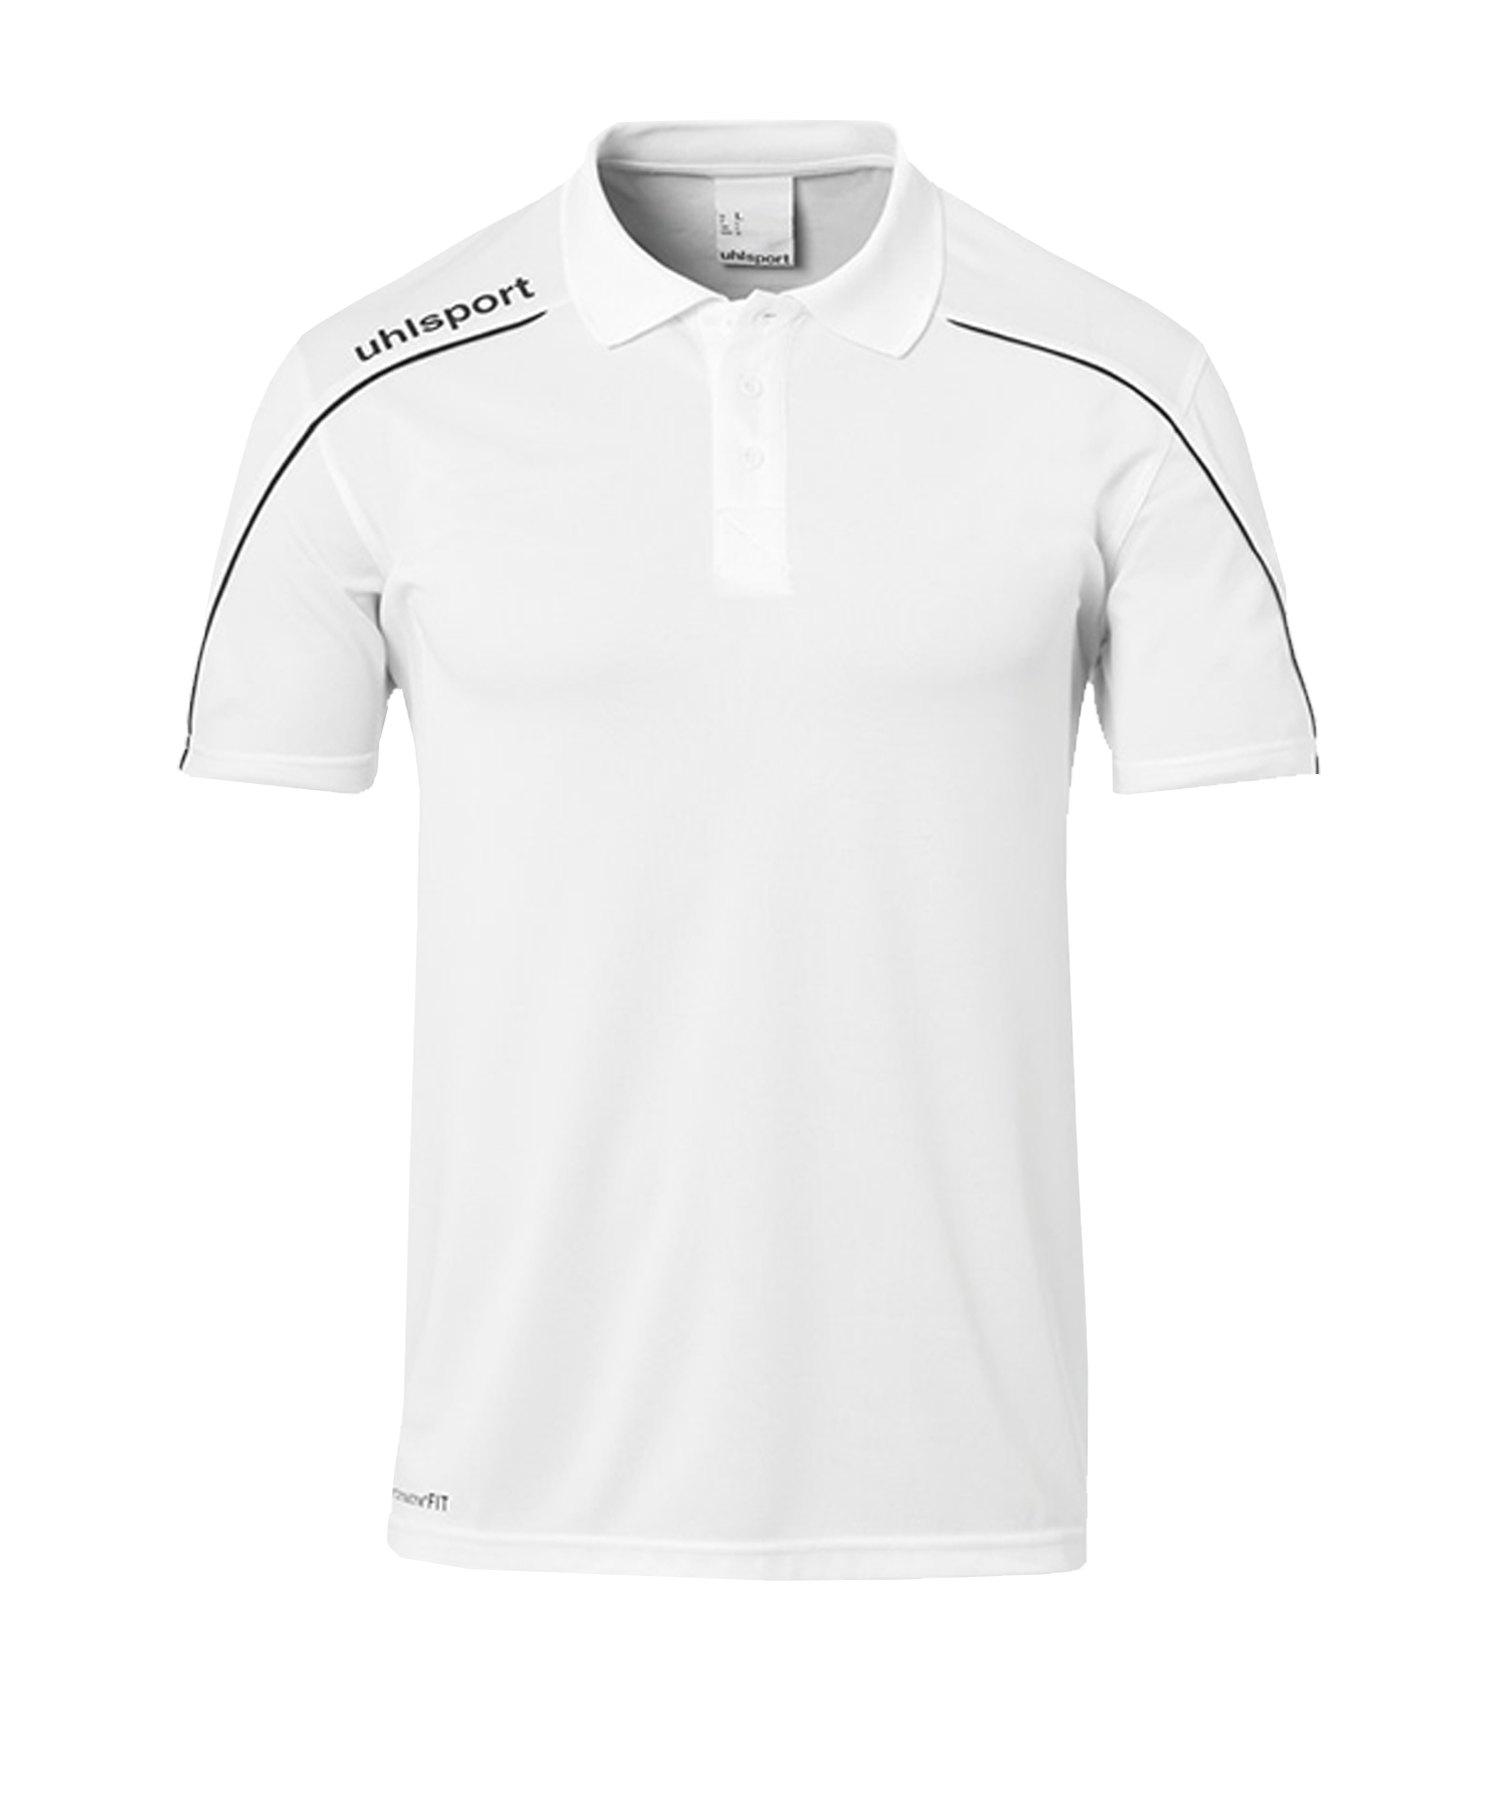 Uhlsport Stream 22 Poloshirt Weiss Schwarz F02 - Weiss